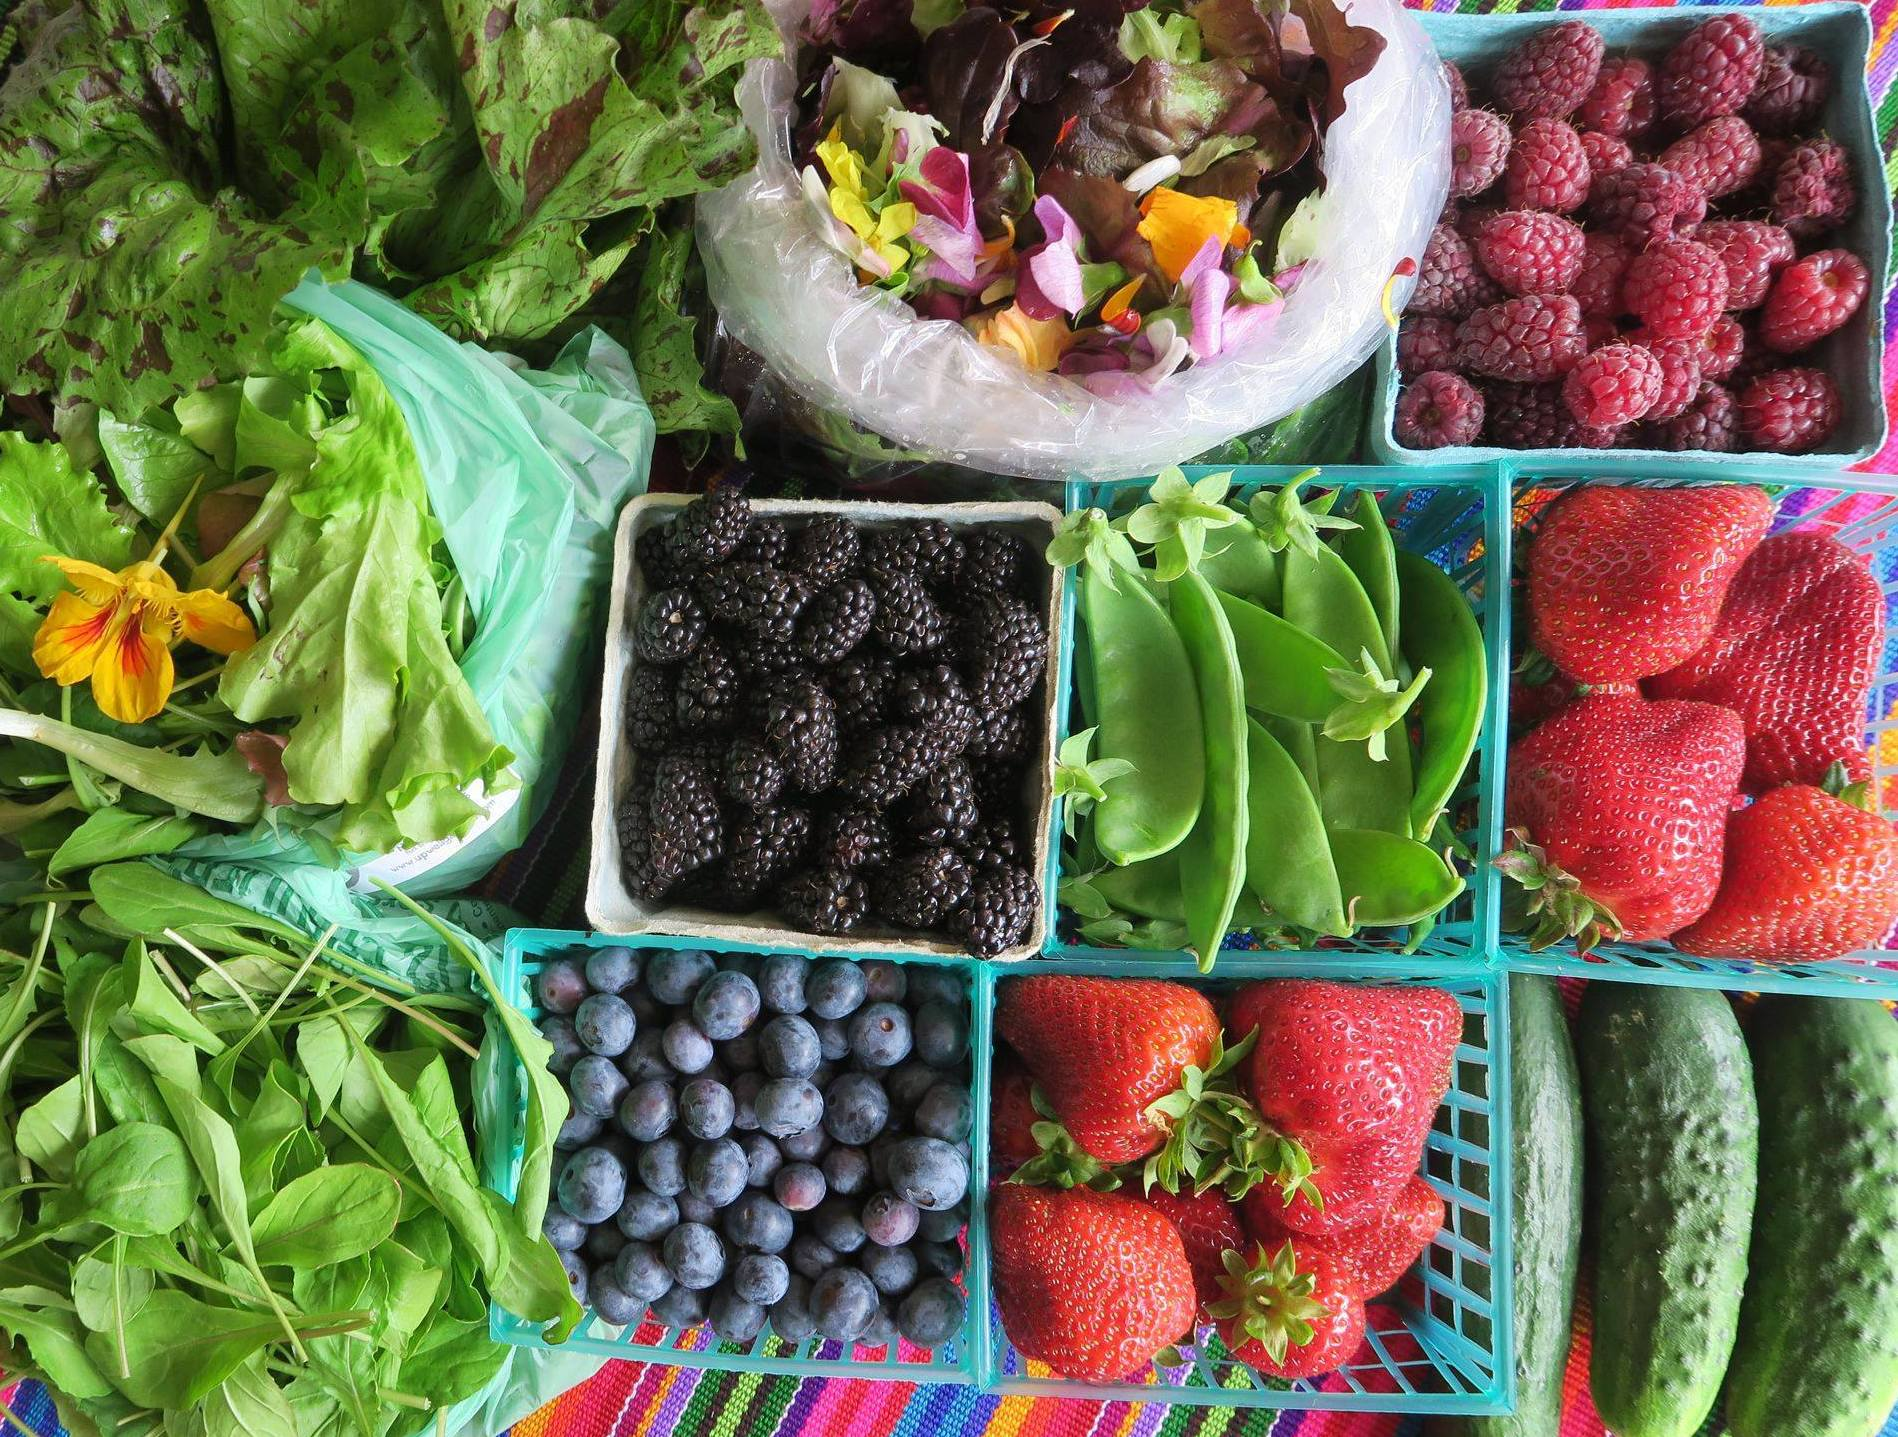 Mendocino Farmer's Market